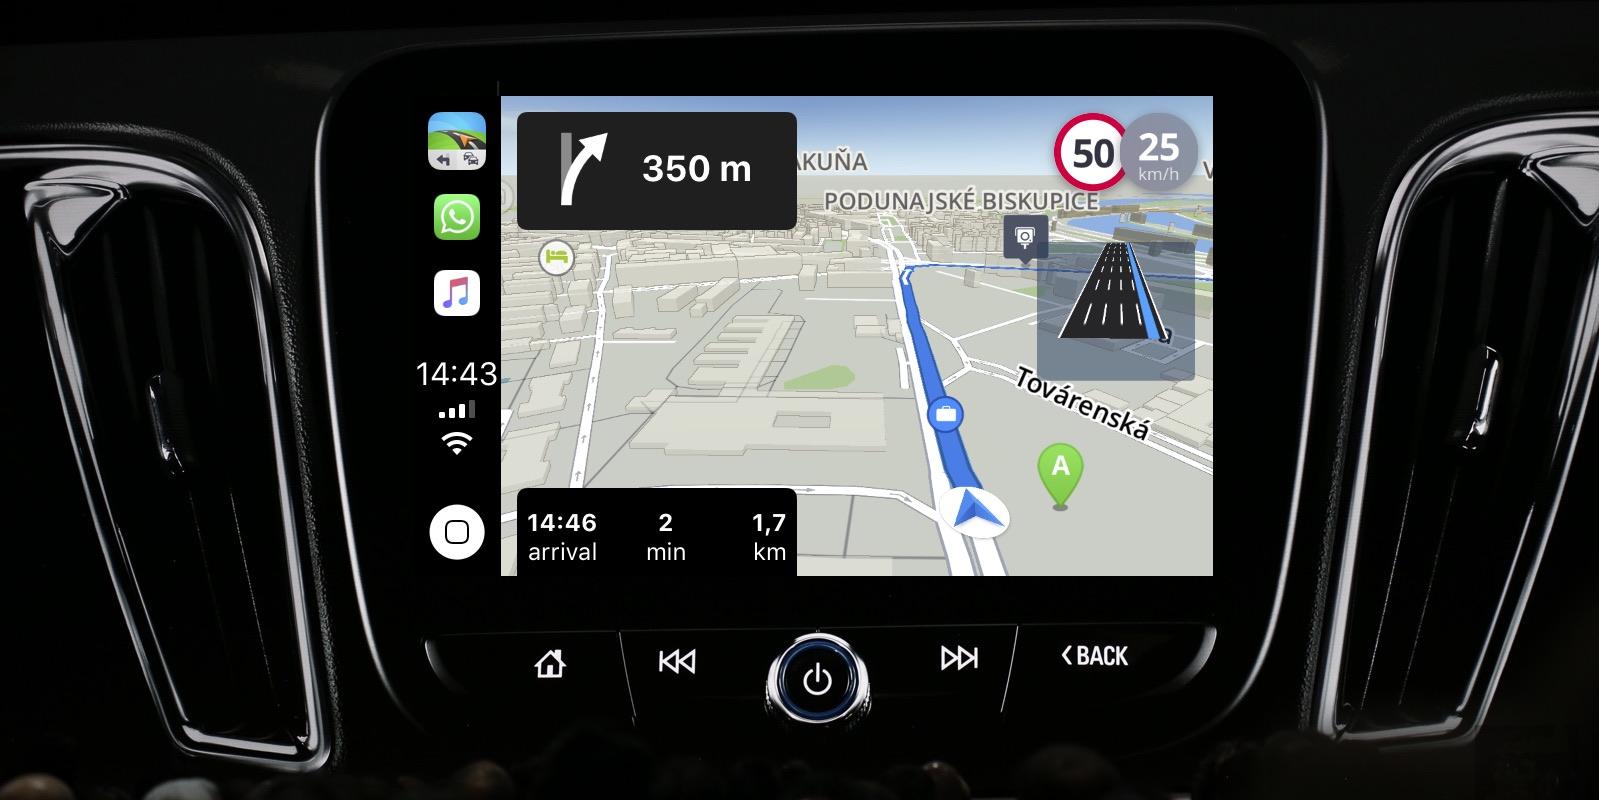 offline maps app sygic teases ios 12 carplay integration. Black Bedroom Furniture Sets. Home Design Ideas